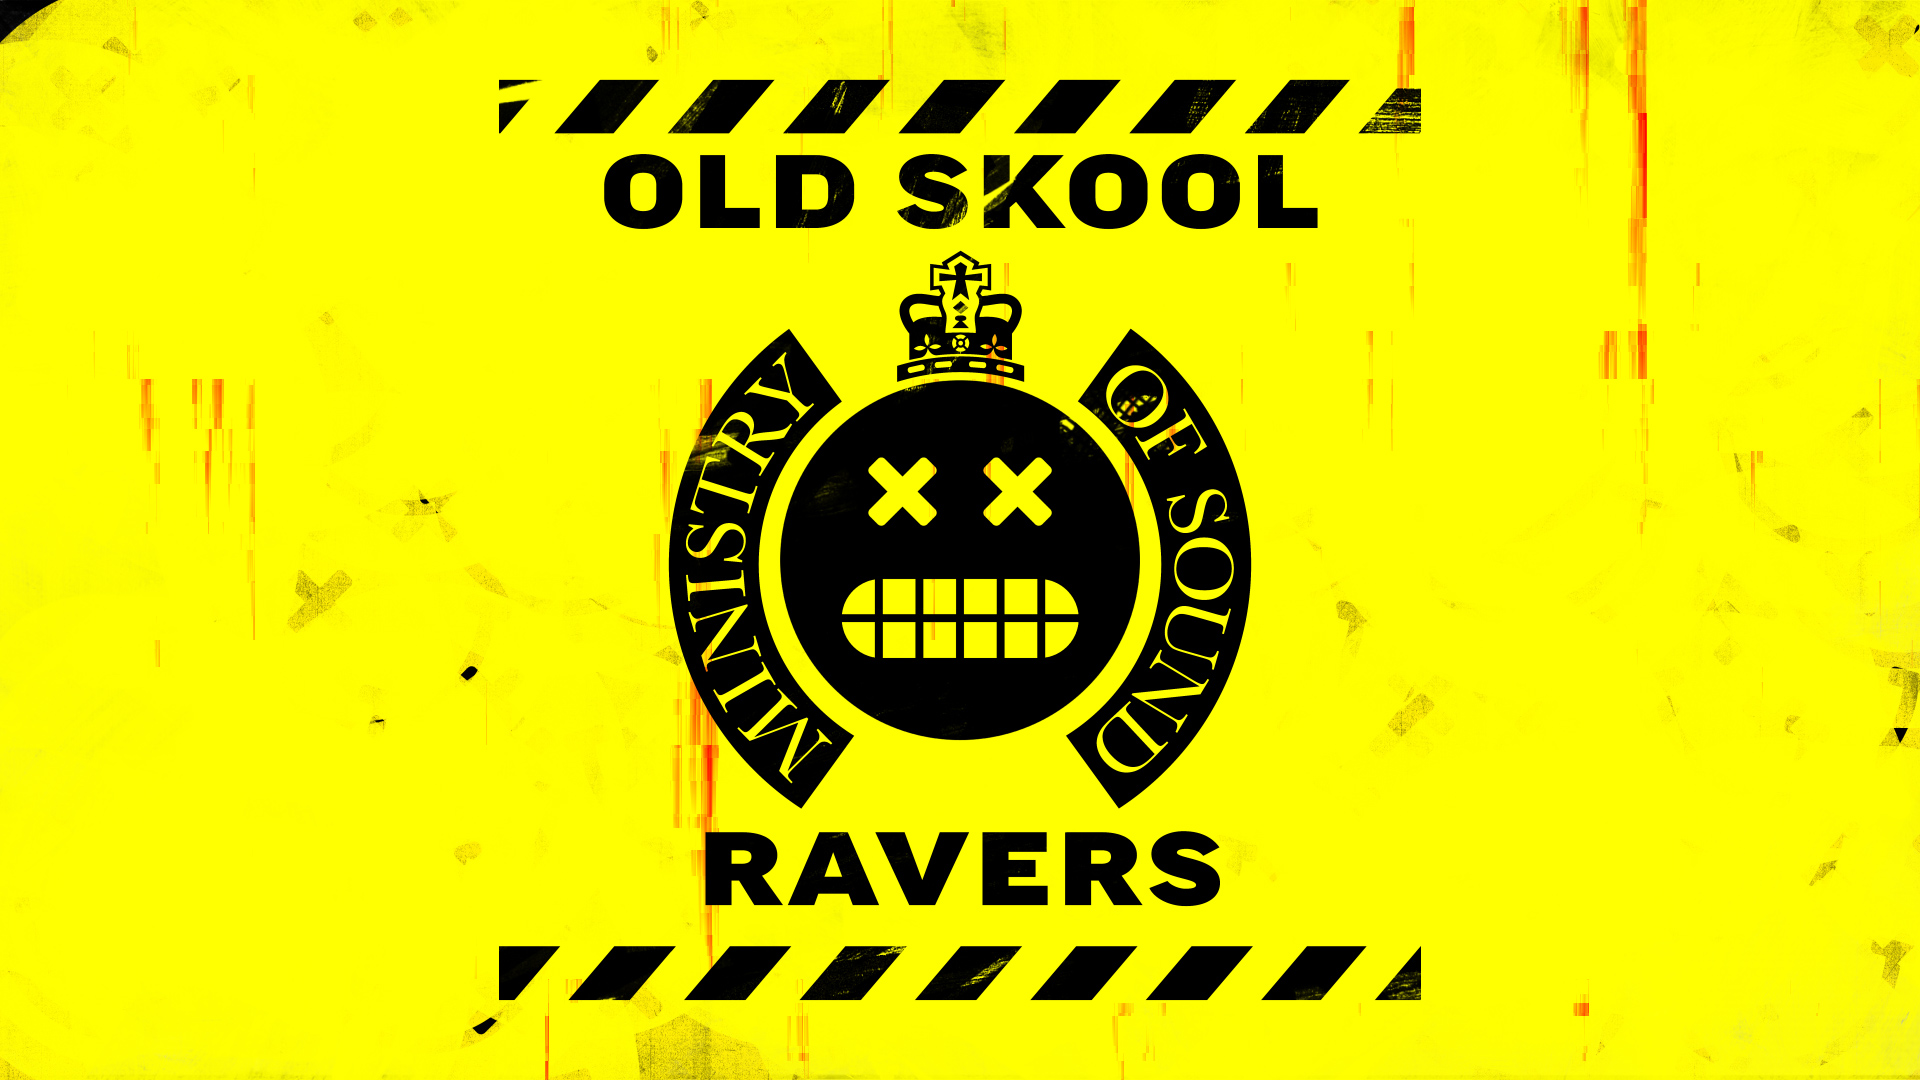 Old-Skool-Ravers_Project_V1 (00685).jpg